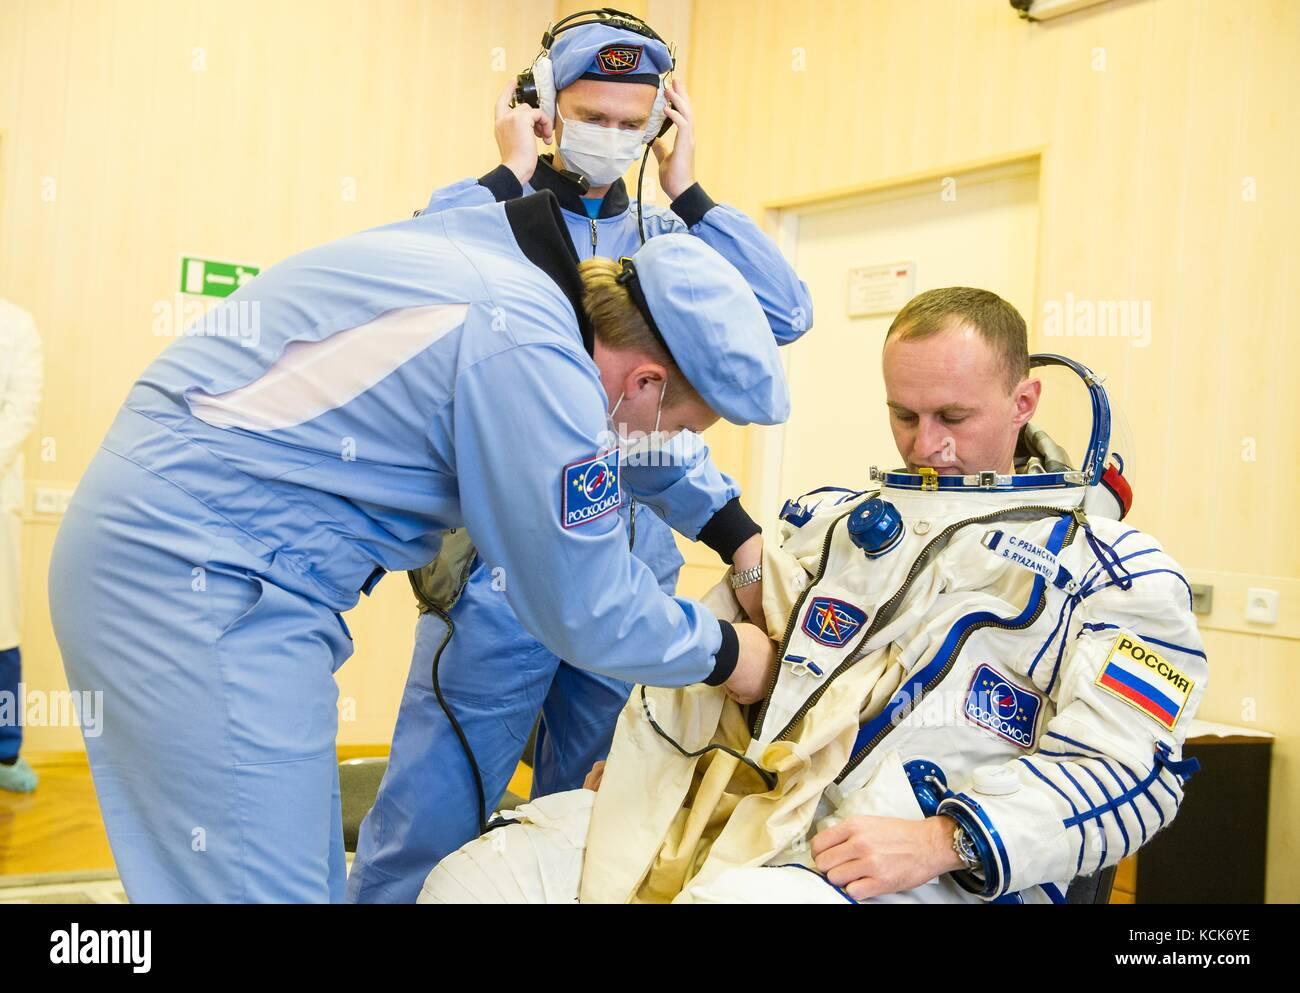 NASA International Space Station Expedition 52 prime crew member Russian cosmonaut Sergey Ryazanskiy of Roscosmos - Stock Image